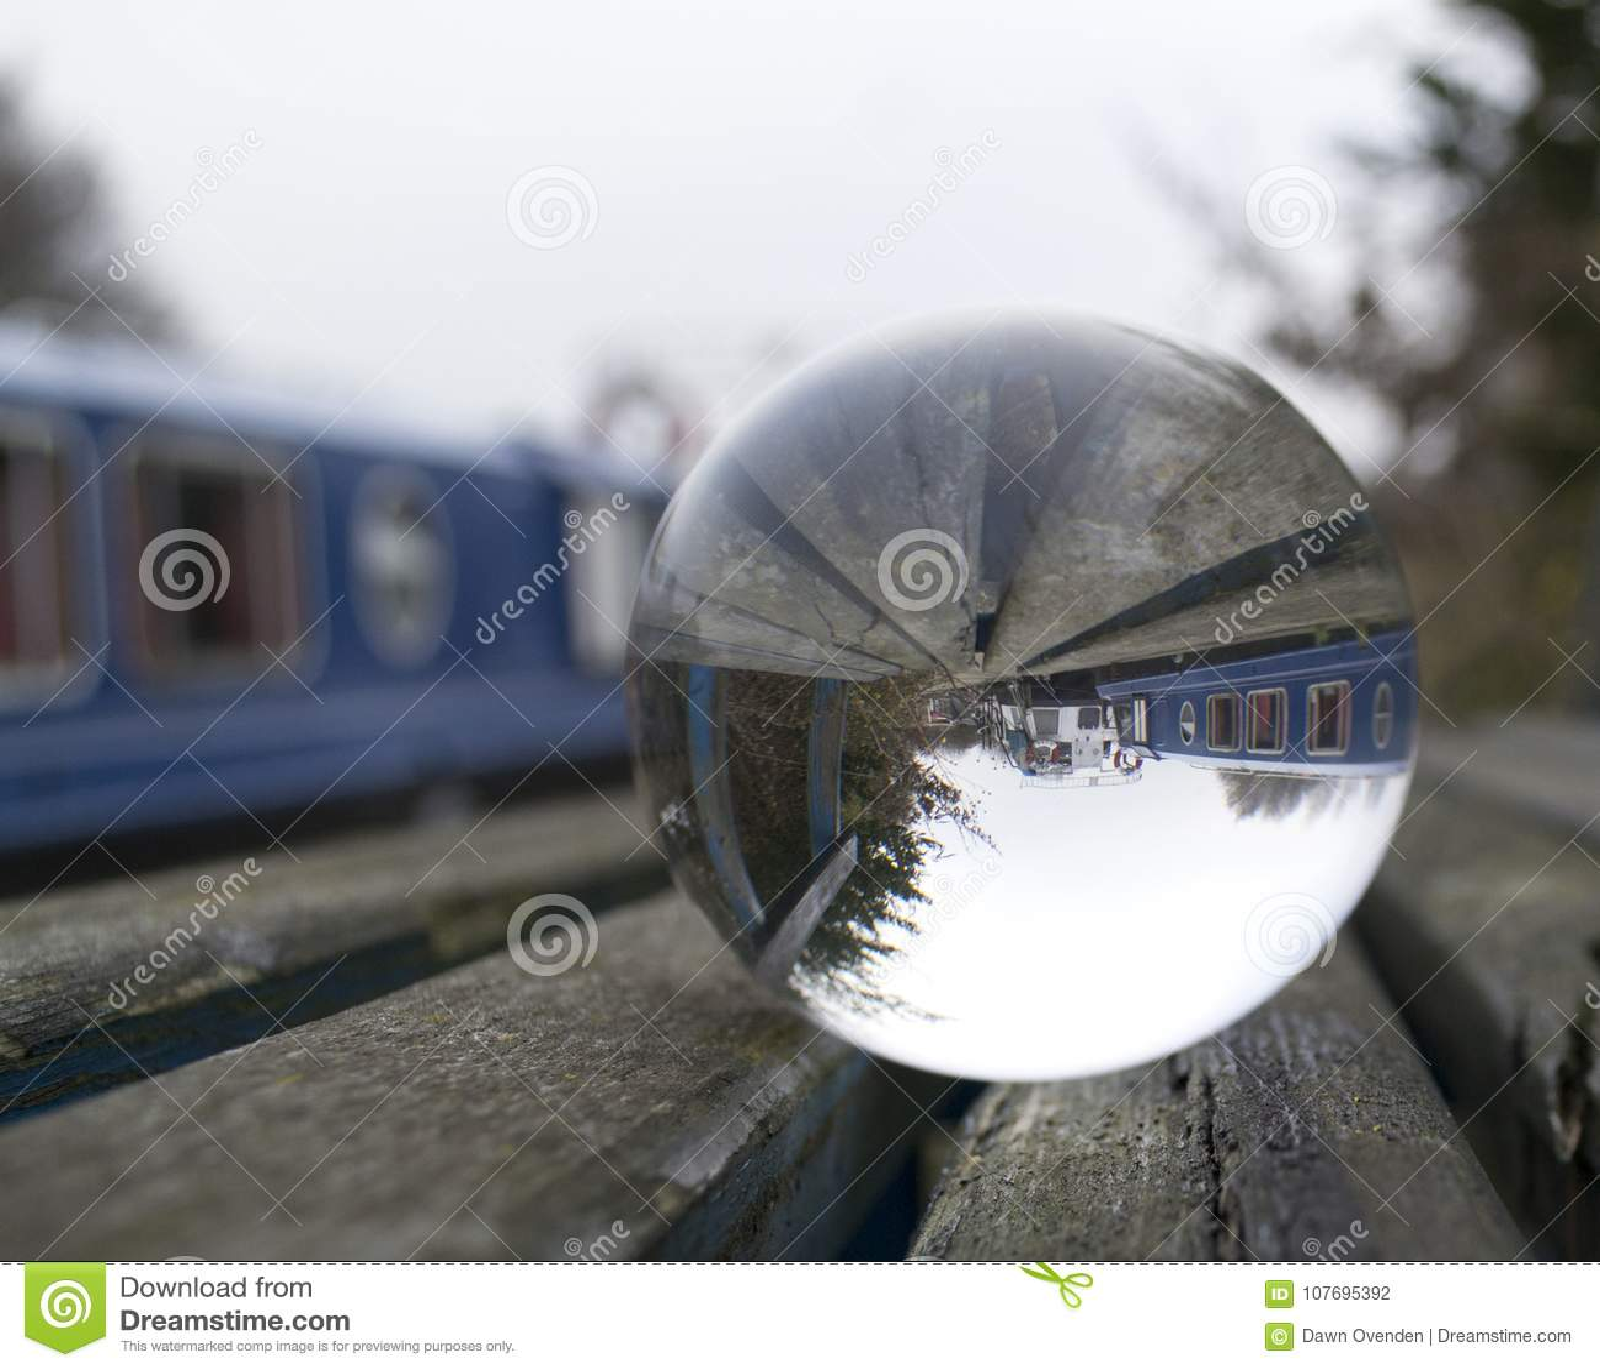 Barcos de canal tomados a través de una esfera de cristal